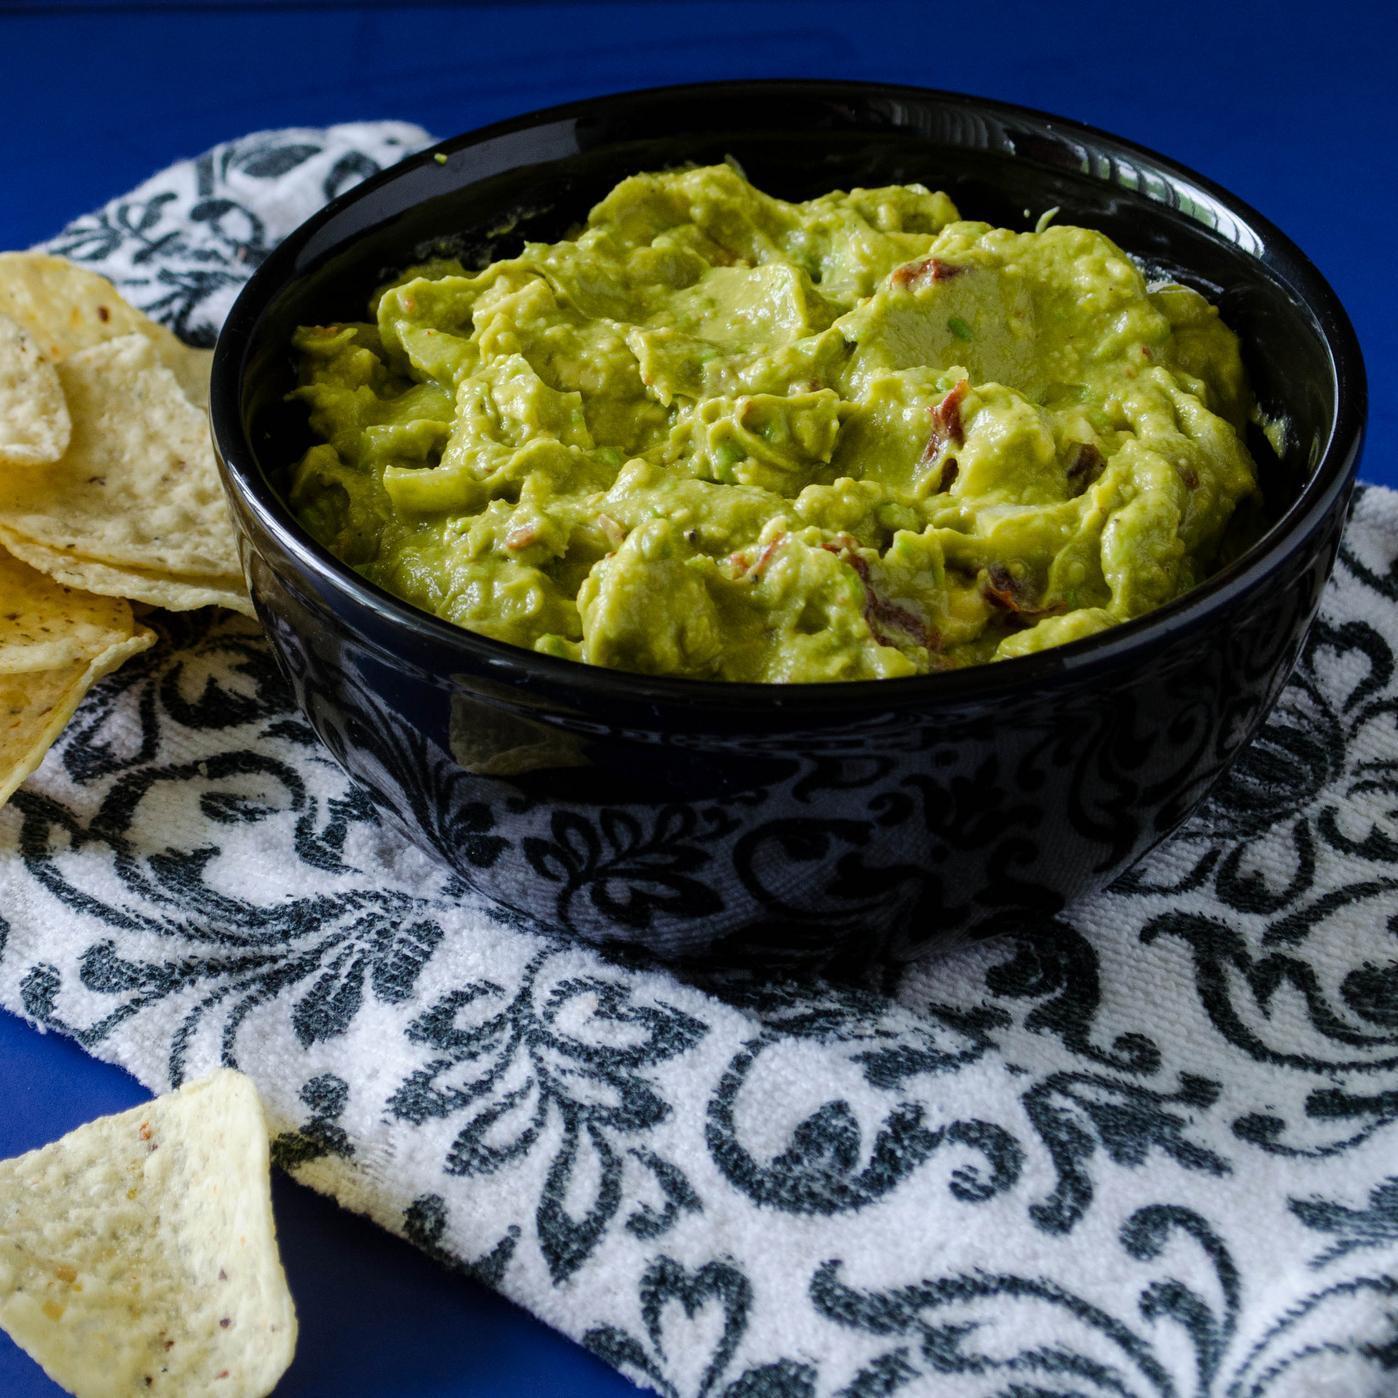 Chipotle Has Finally Unveiled Its Guacamole Recipe